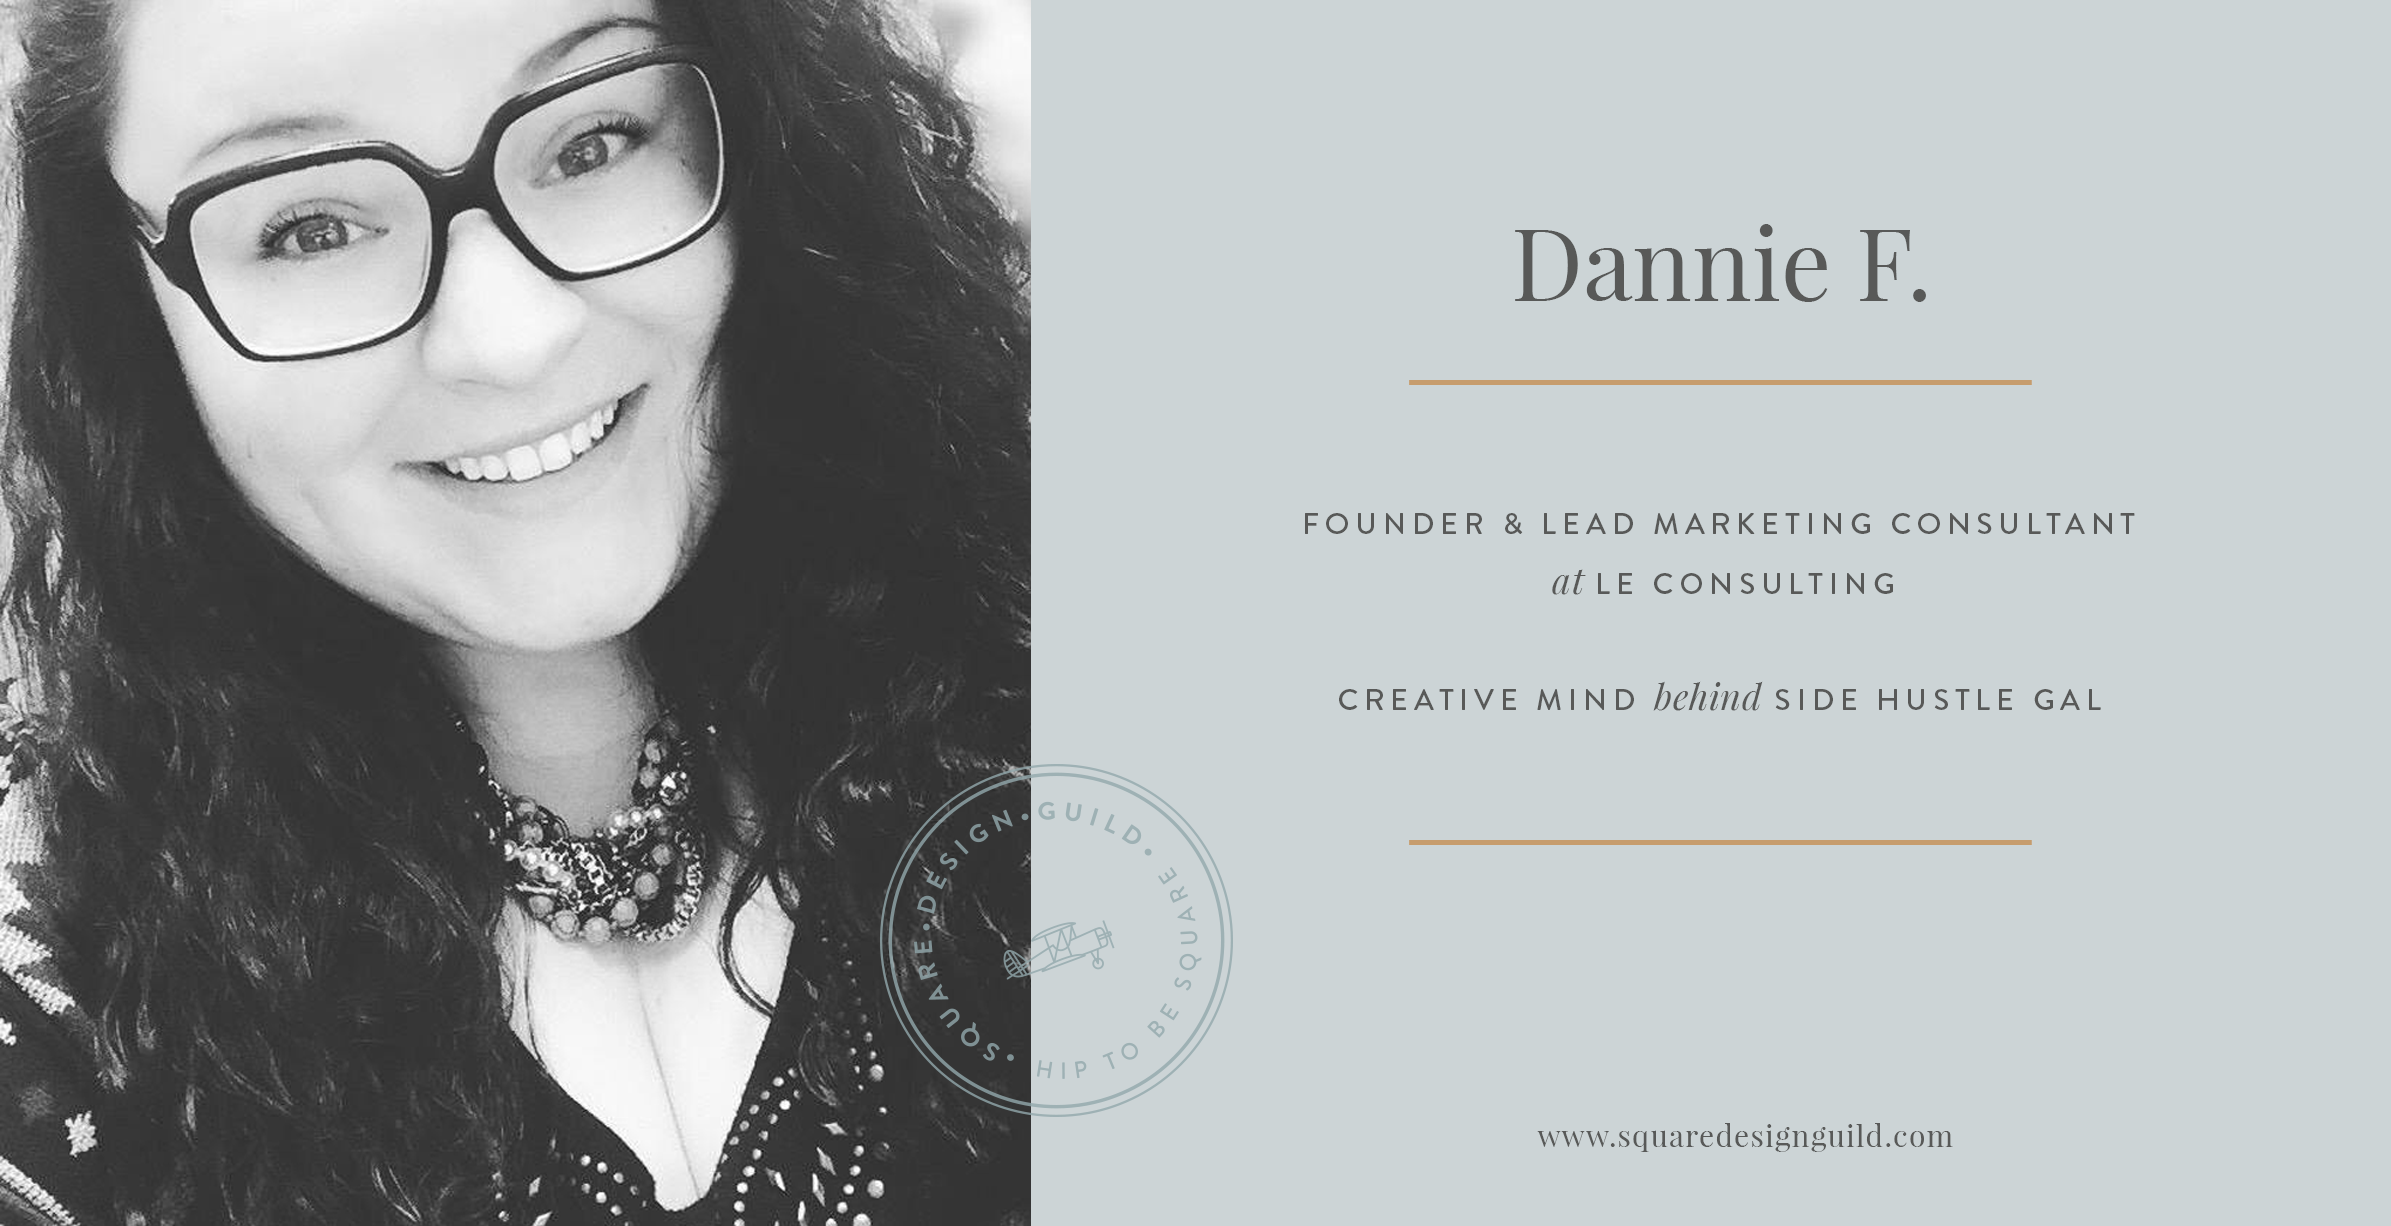 Squarespace Design Guild   Member Profile   Designer Interview   Dannie F from LE Consulting